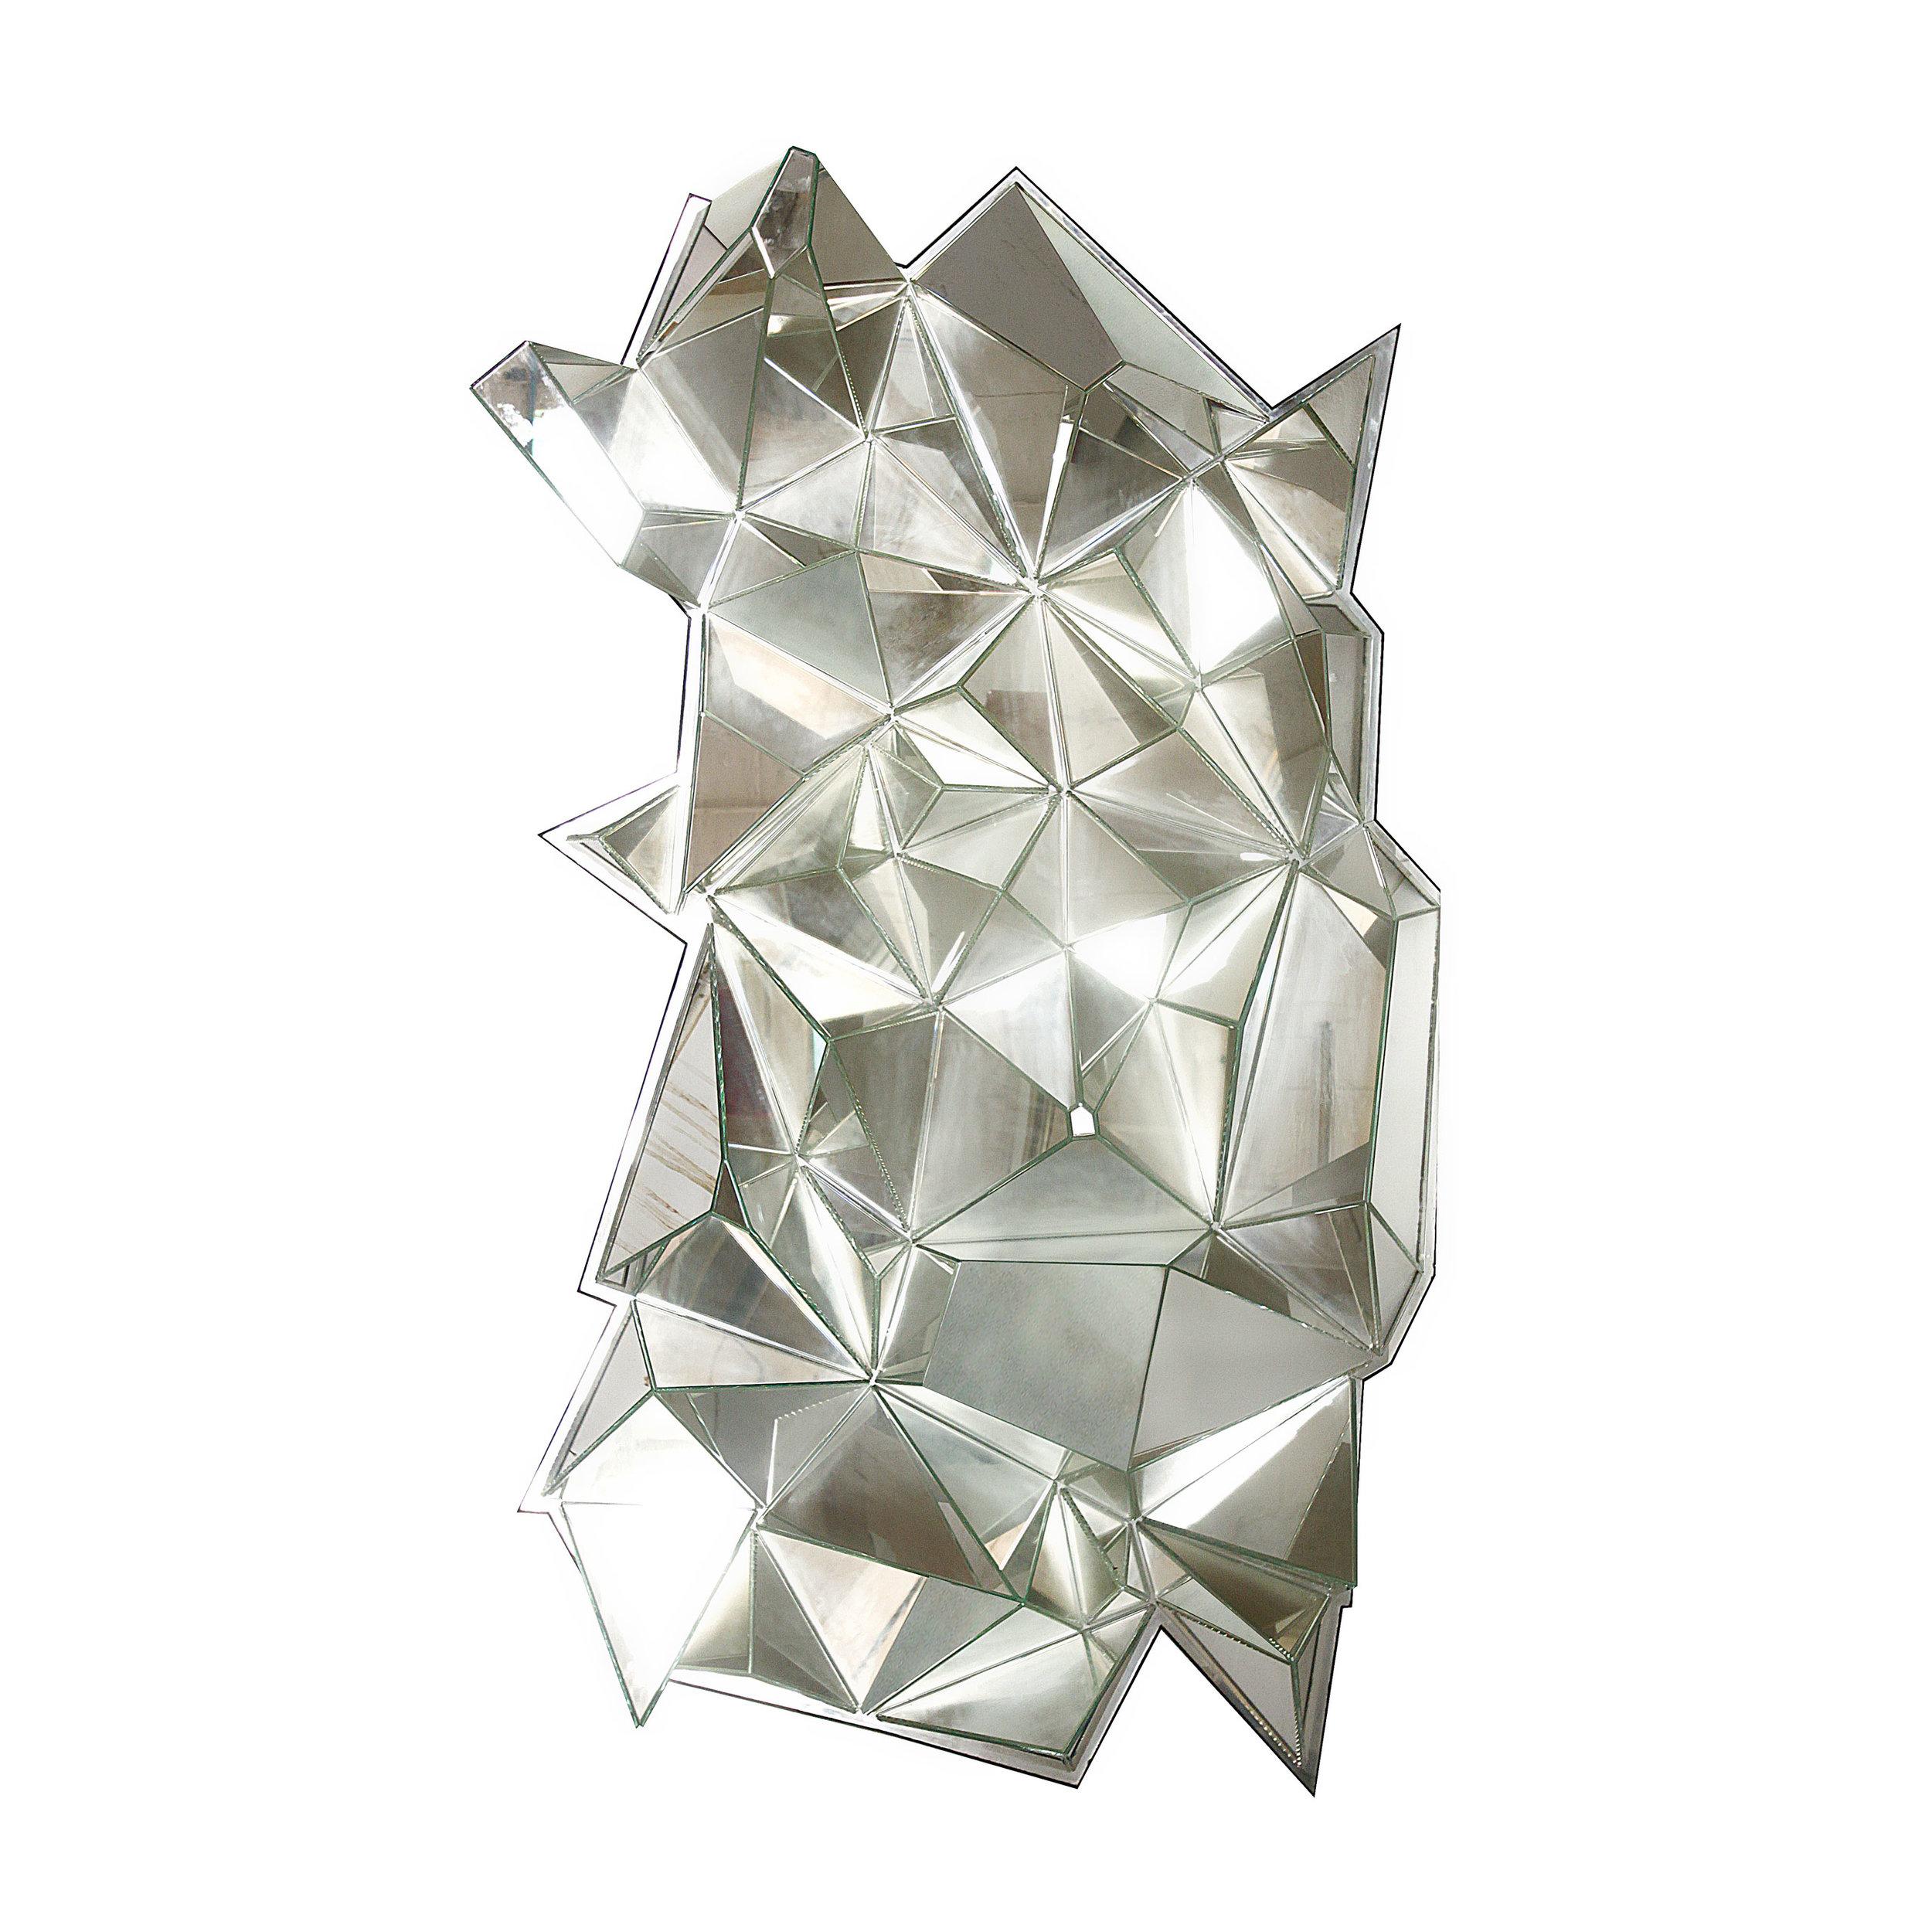 Artisan Multi-Faceted Decorative Mirror